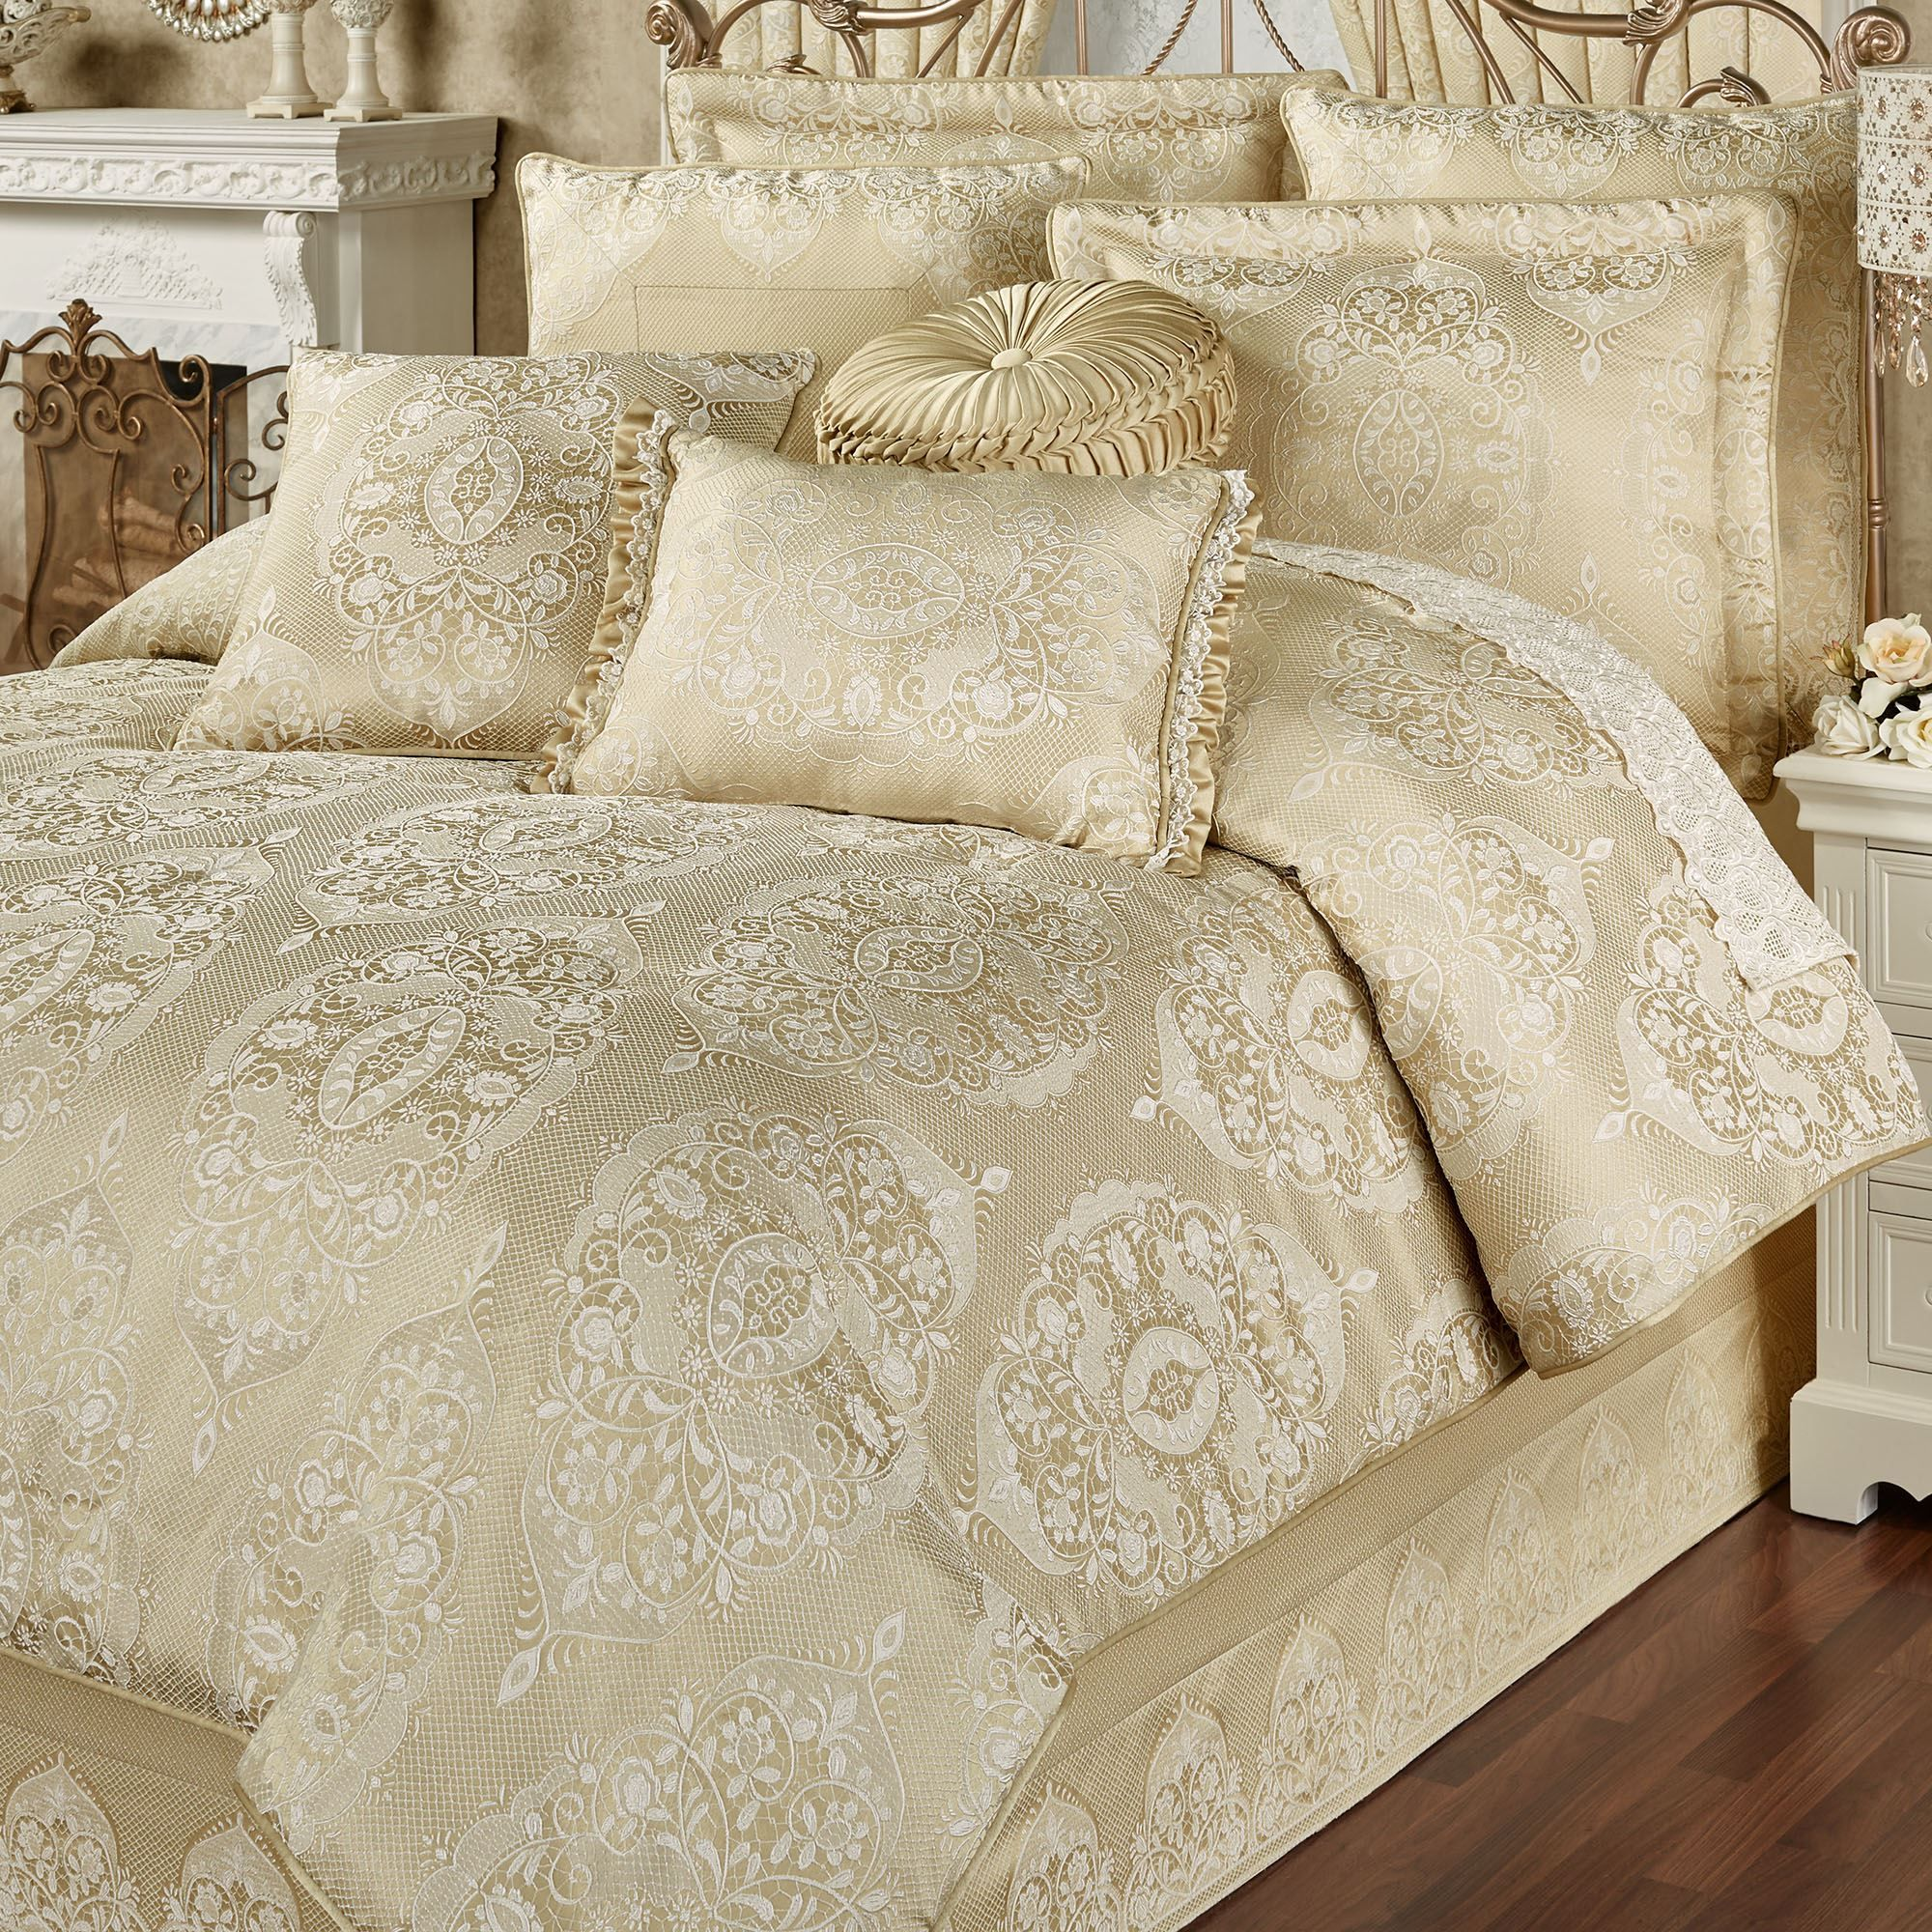 Francesca Light Gold Comforter Bedding Luxury Bedding Luxurious Bedrooms Luxury Bedding Sets